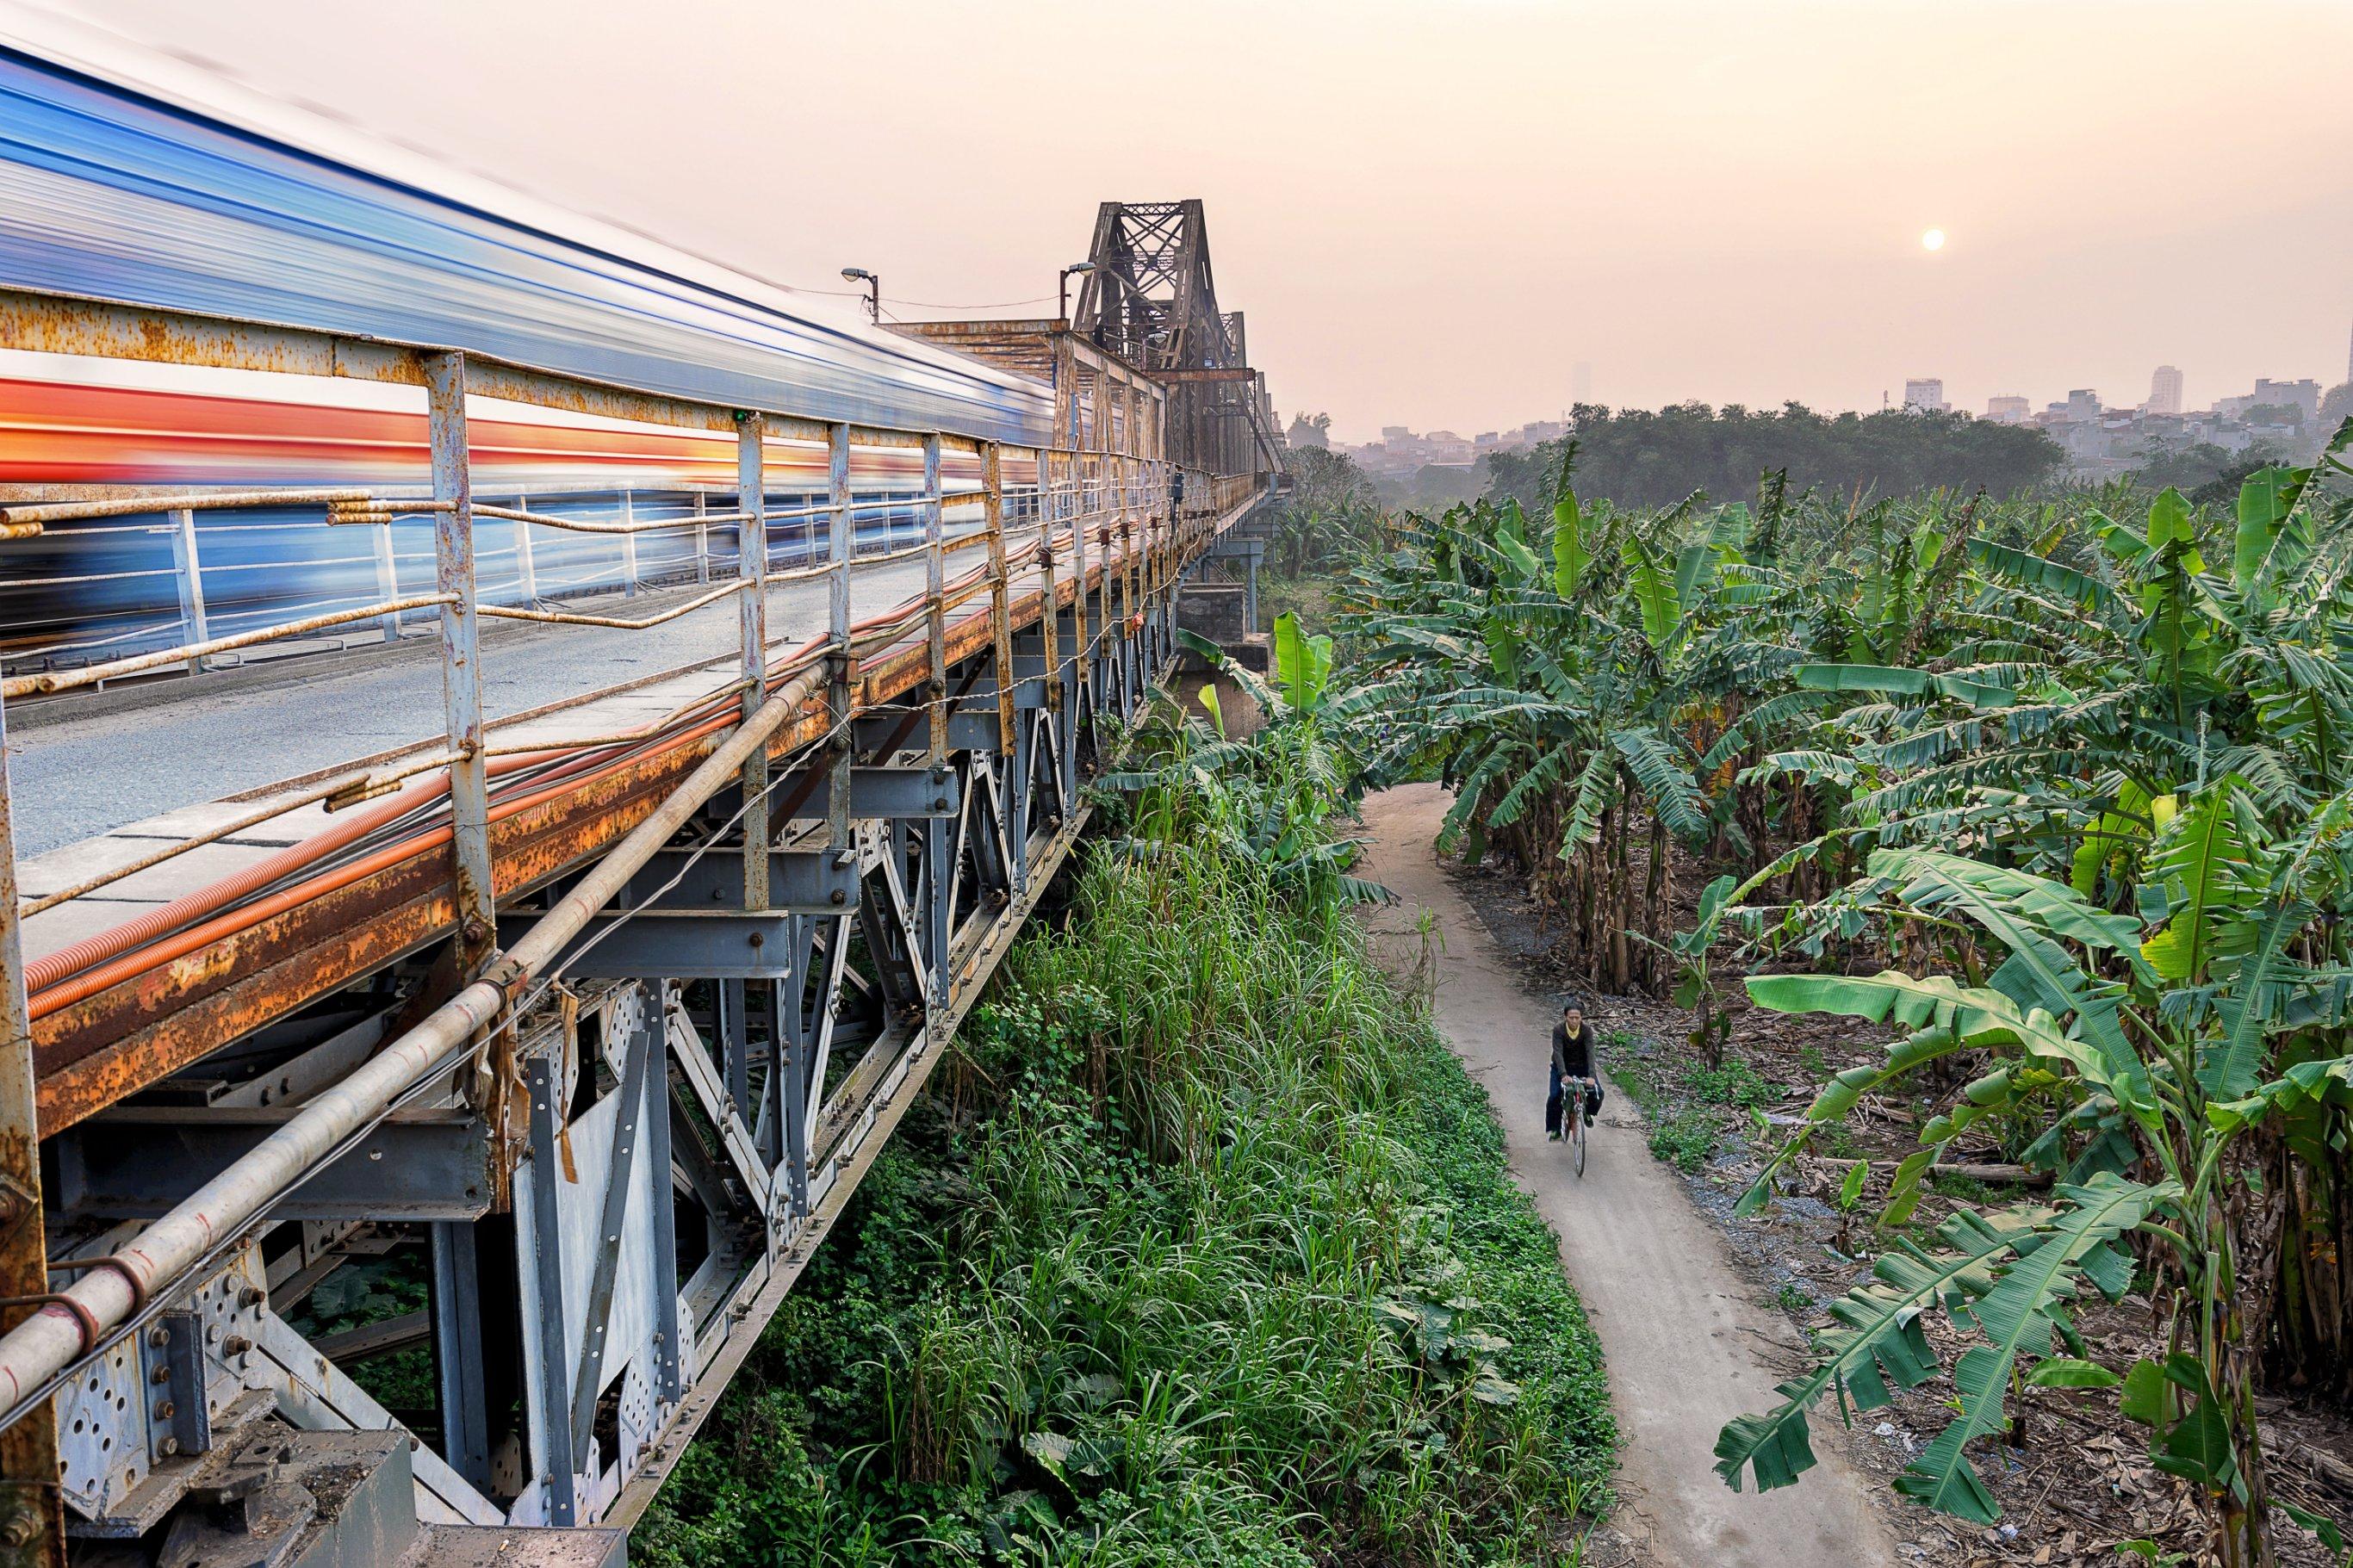 5-Day Deluxe Hanoi and Halong Bay Itinerary - Vietnam Itinerary